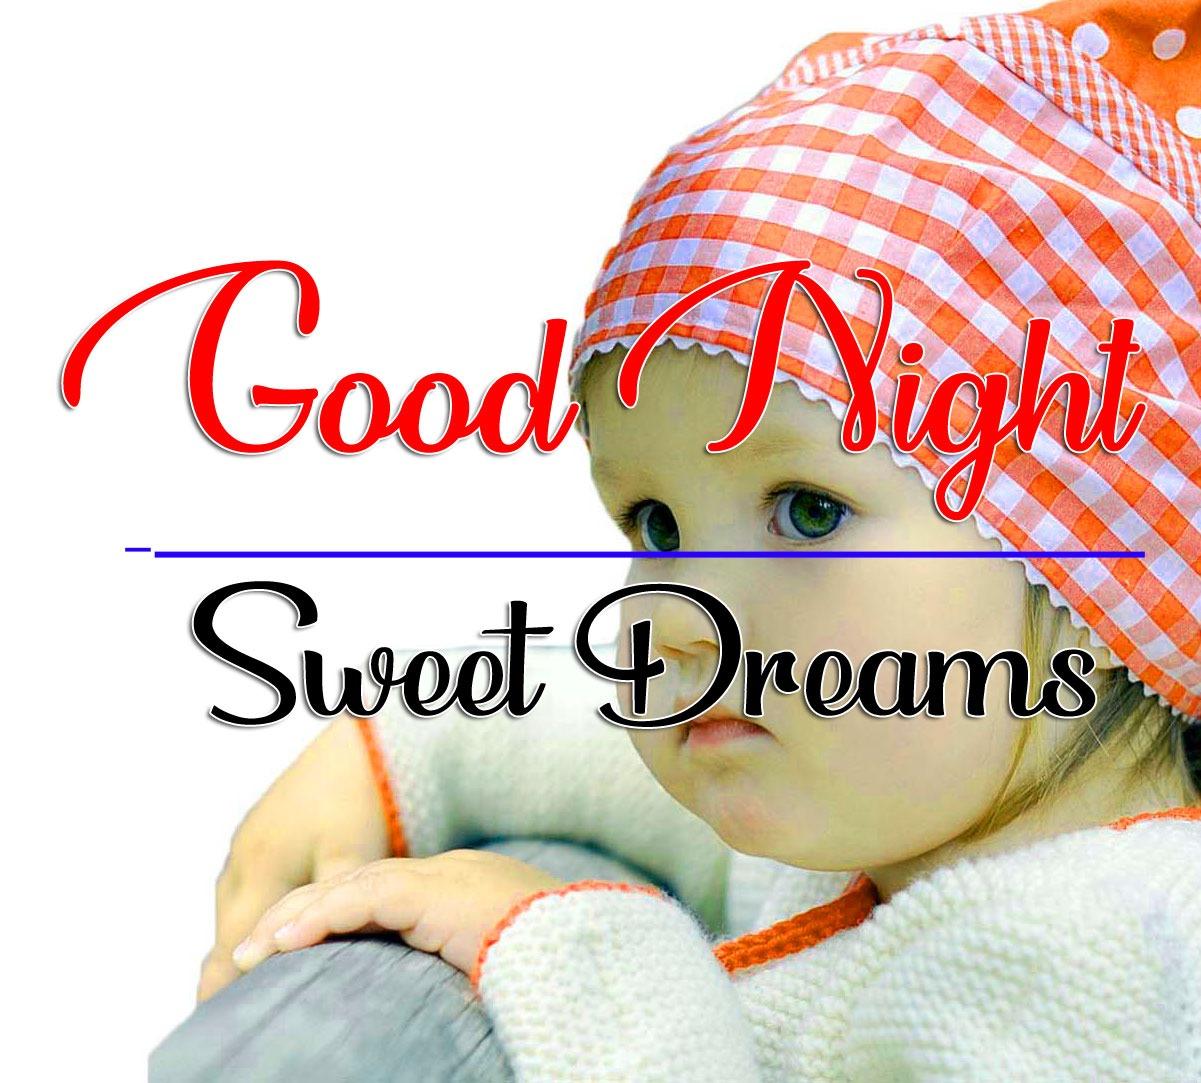 Cute Baby HD Good Night Wallpaper